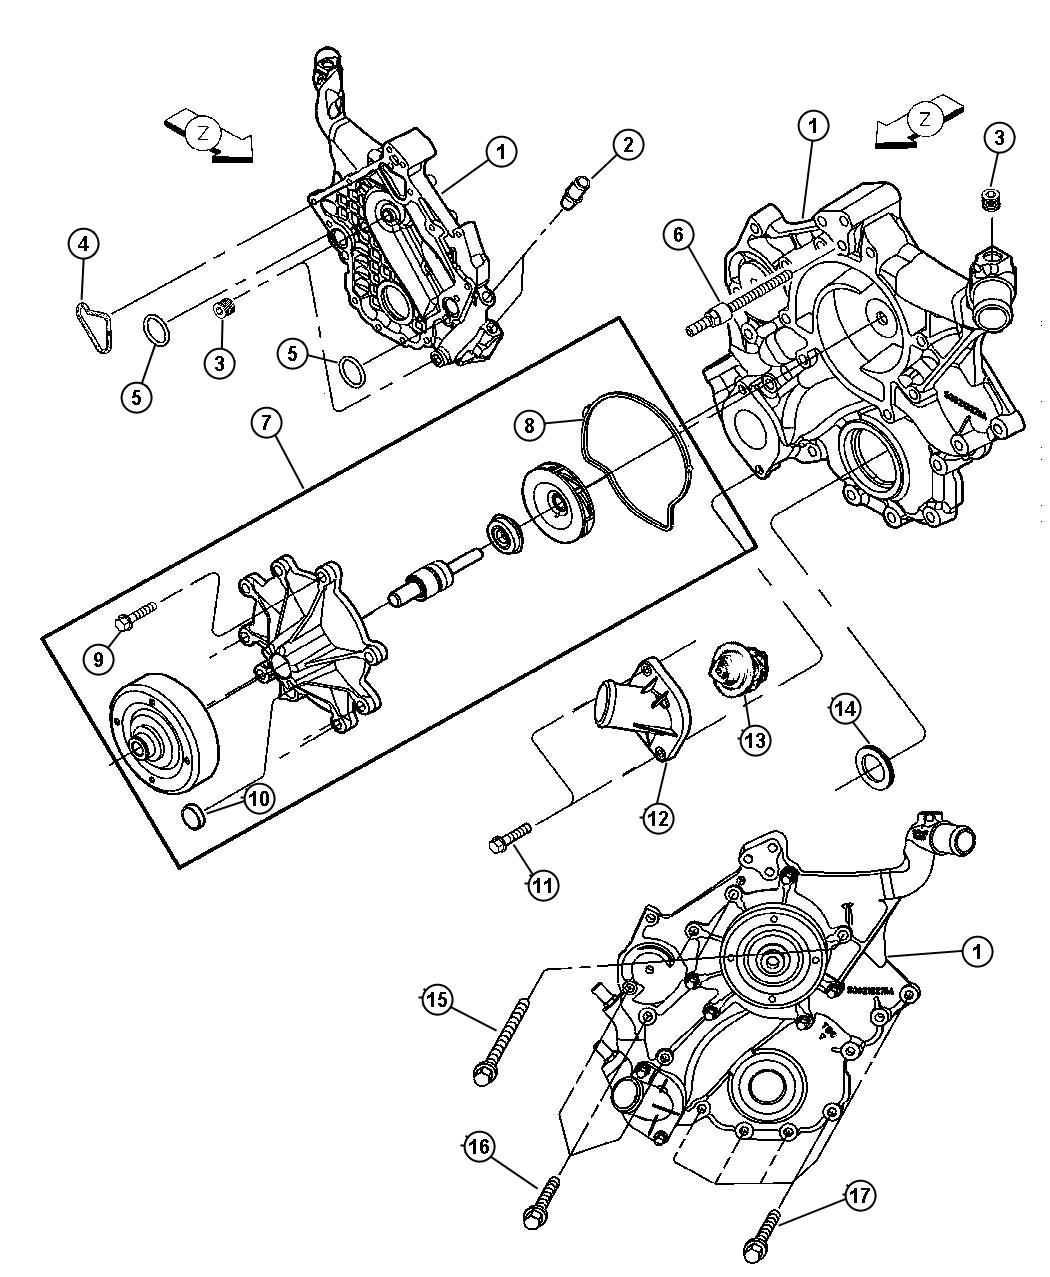 Liberty X 24 Cylinder Engine, Liberty, Free Engine Image